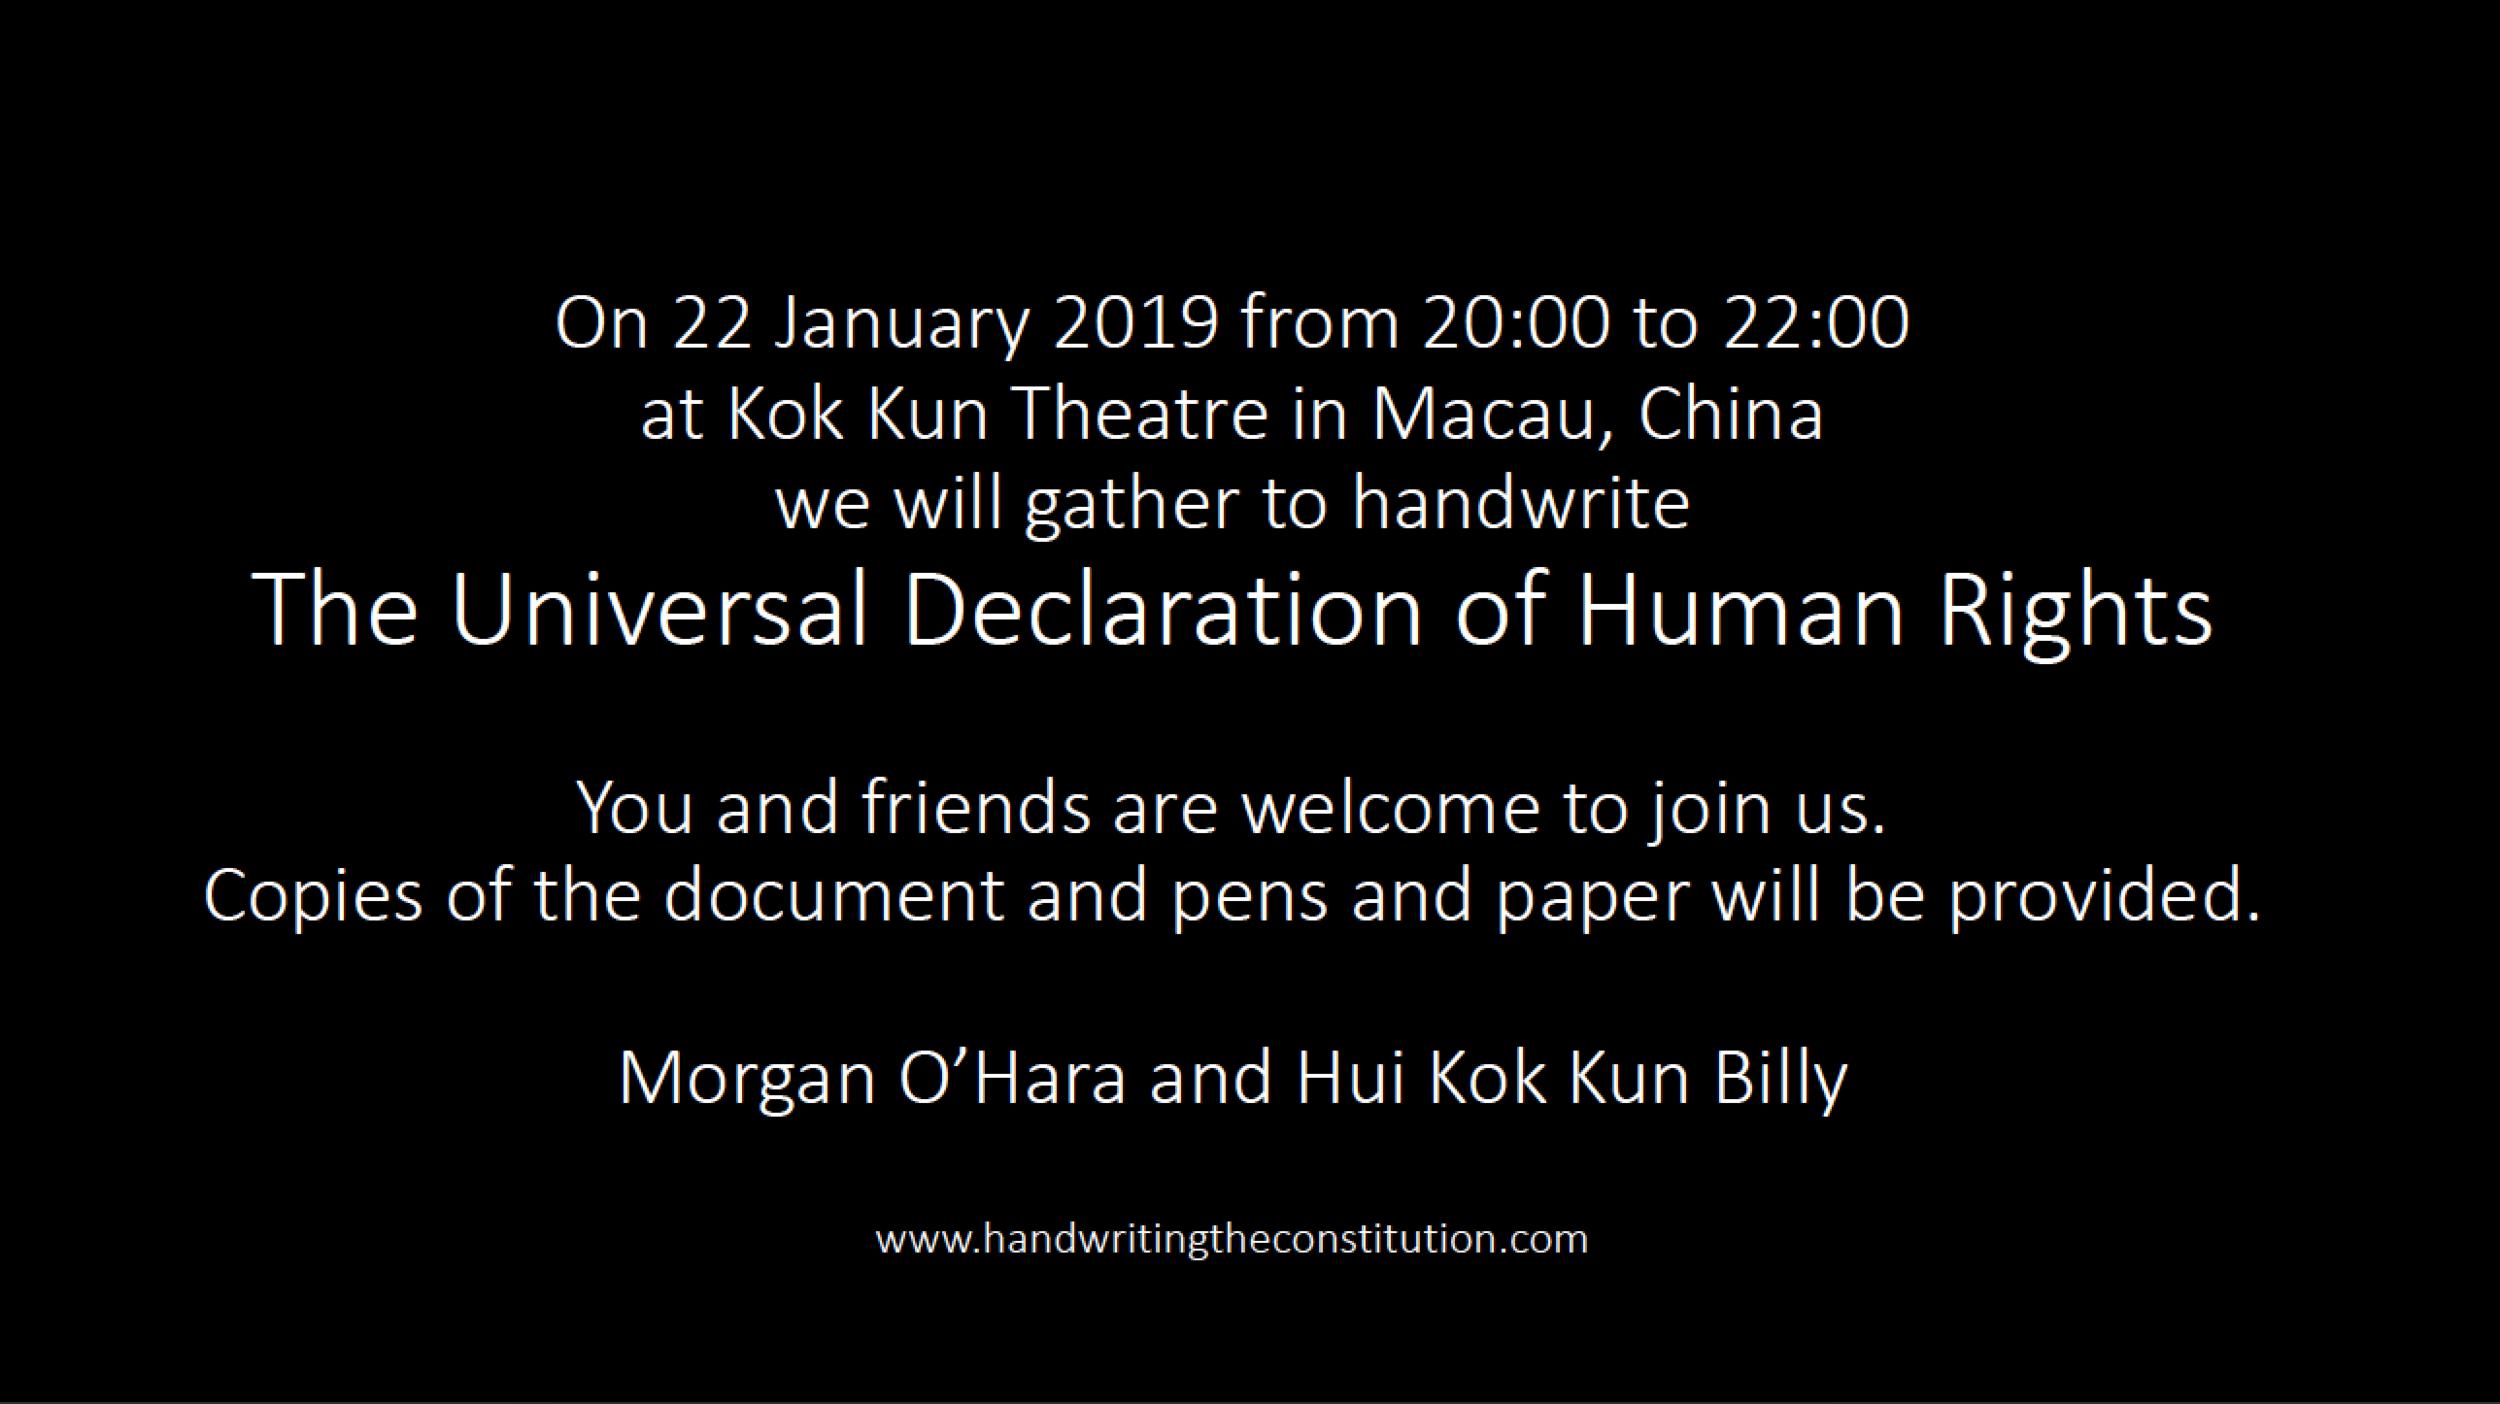 22 January 2019macau, china - session 90morgan o'hara and hui kok kun billy